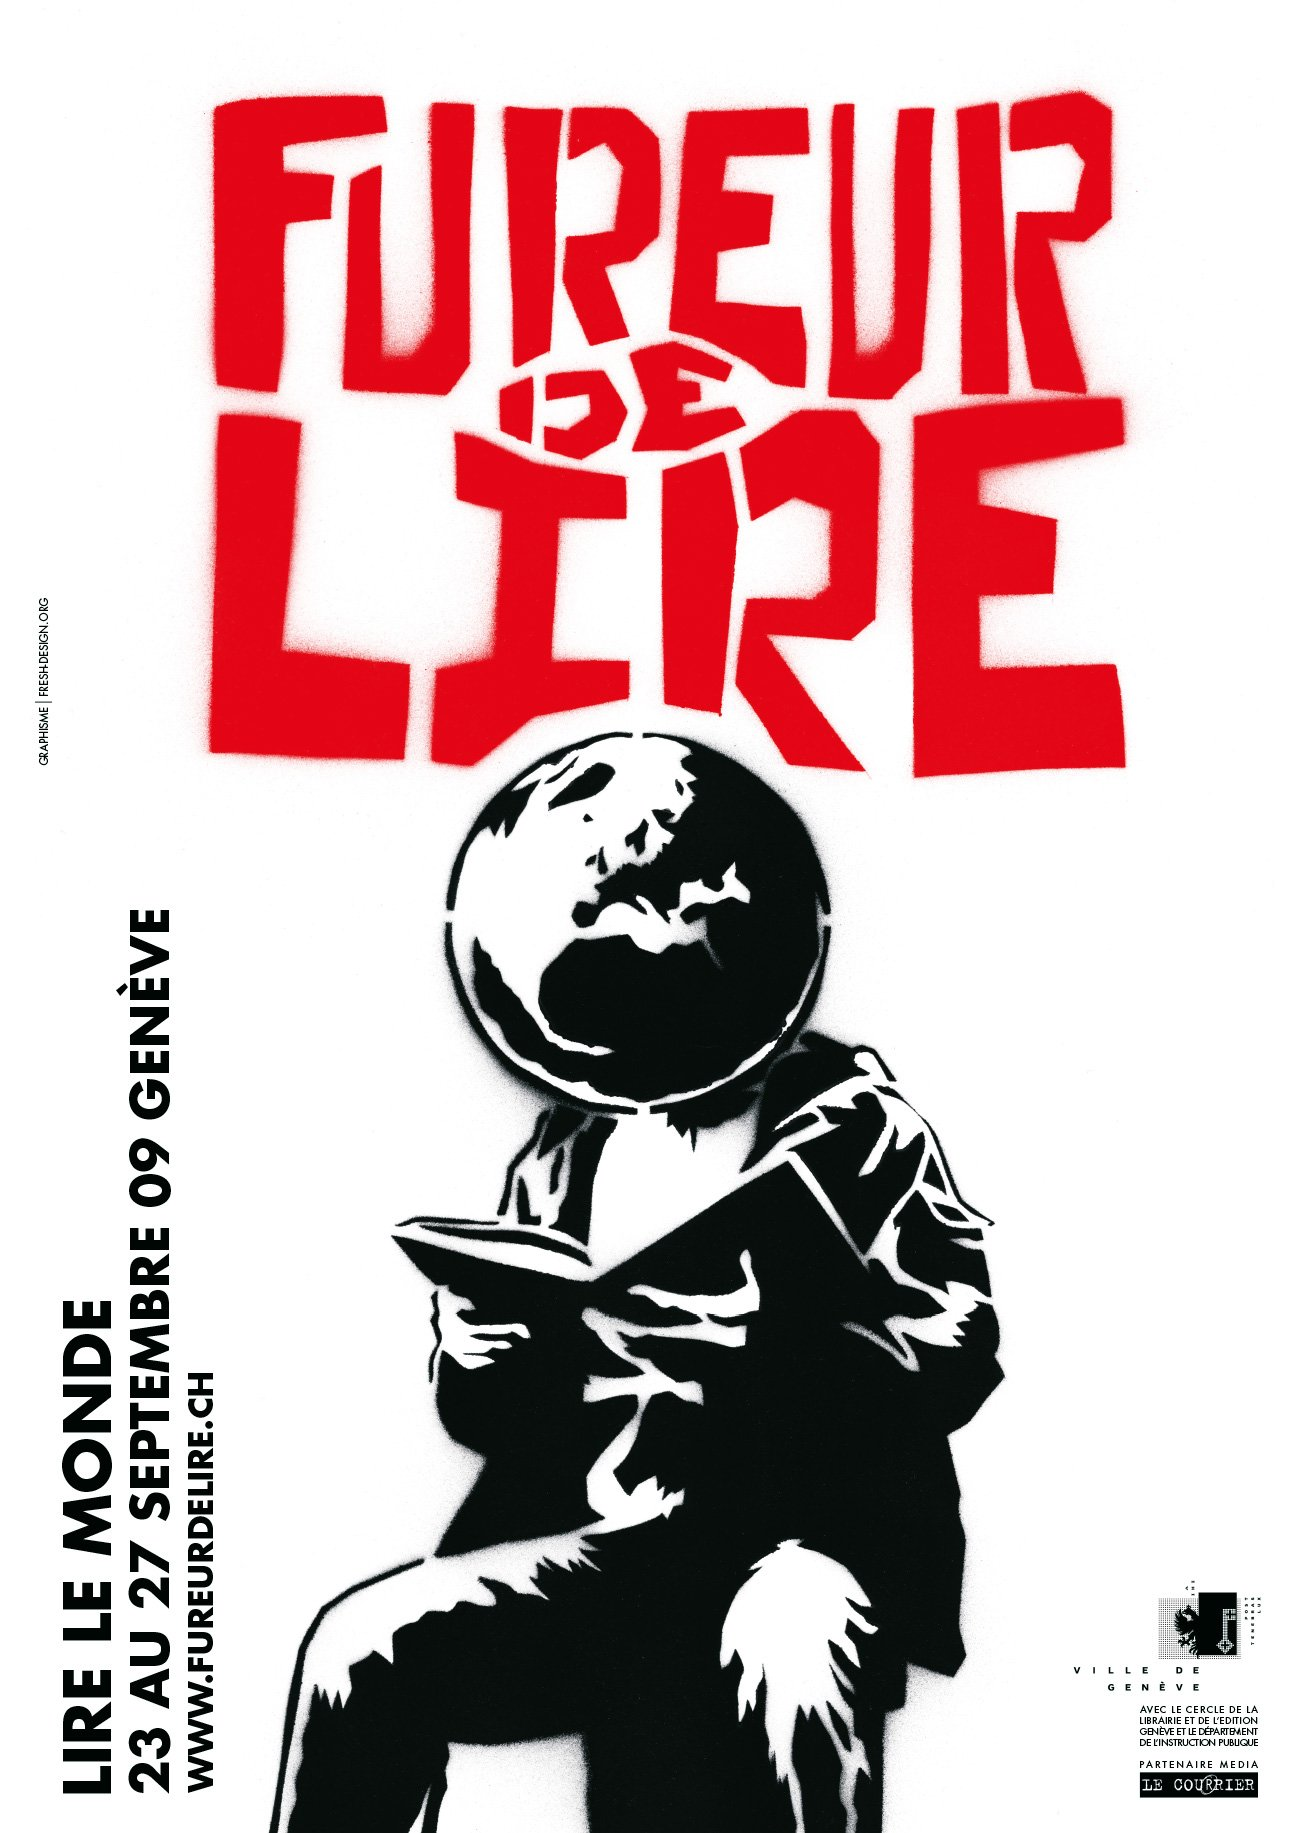 fabien_cuffel_affiche_festival_litteraire_fureur_lire_2009